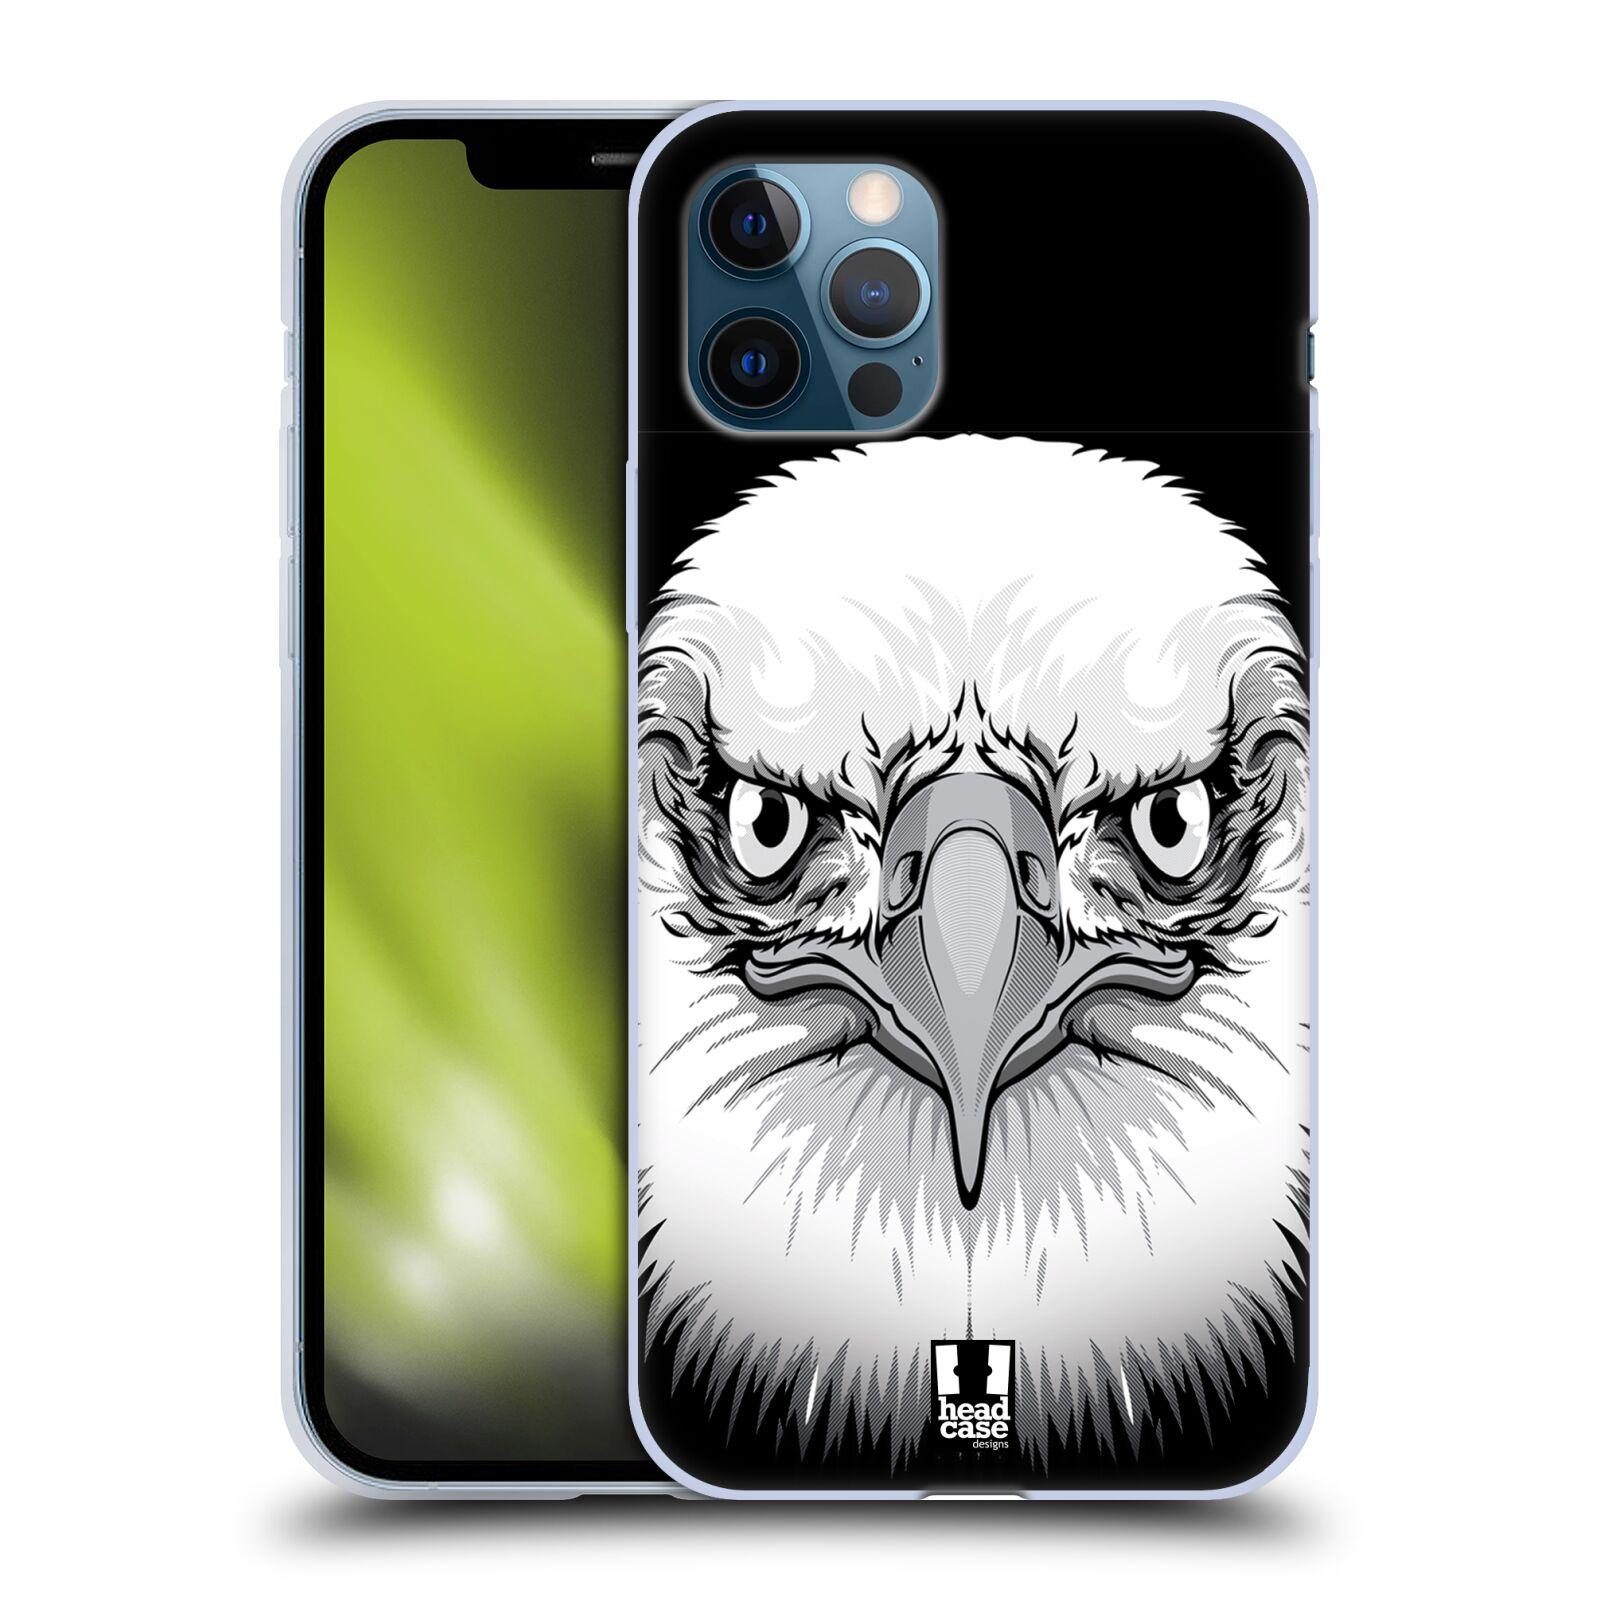 Silikonové pouzdro na mobil Apple iPhone 12 / 12 Pro - Head Case - ILUSTROVANÝ OREL